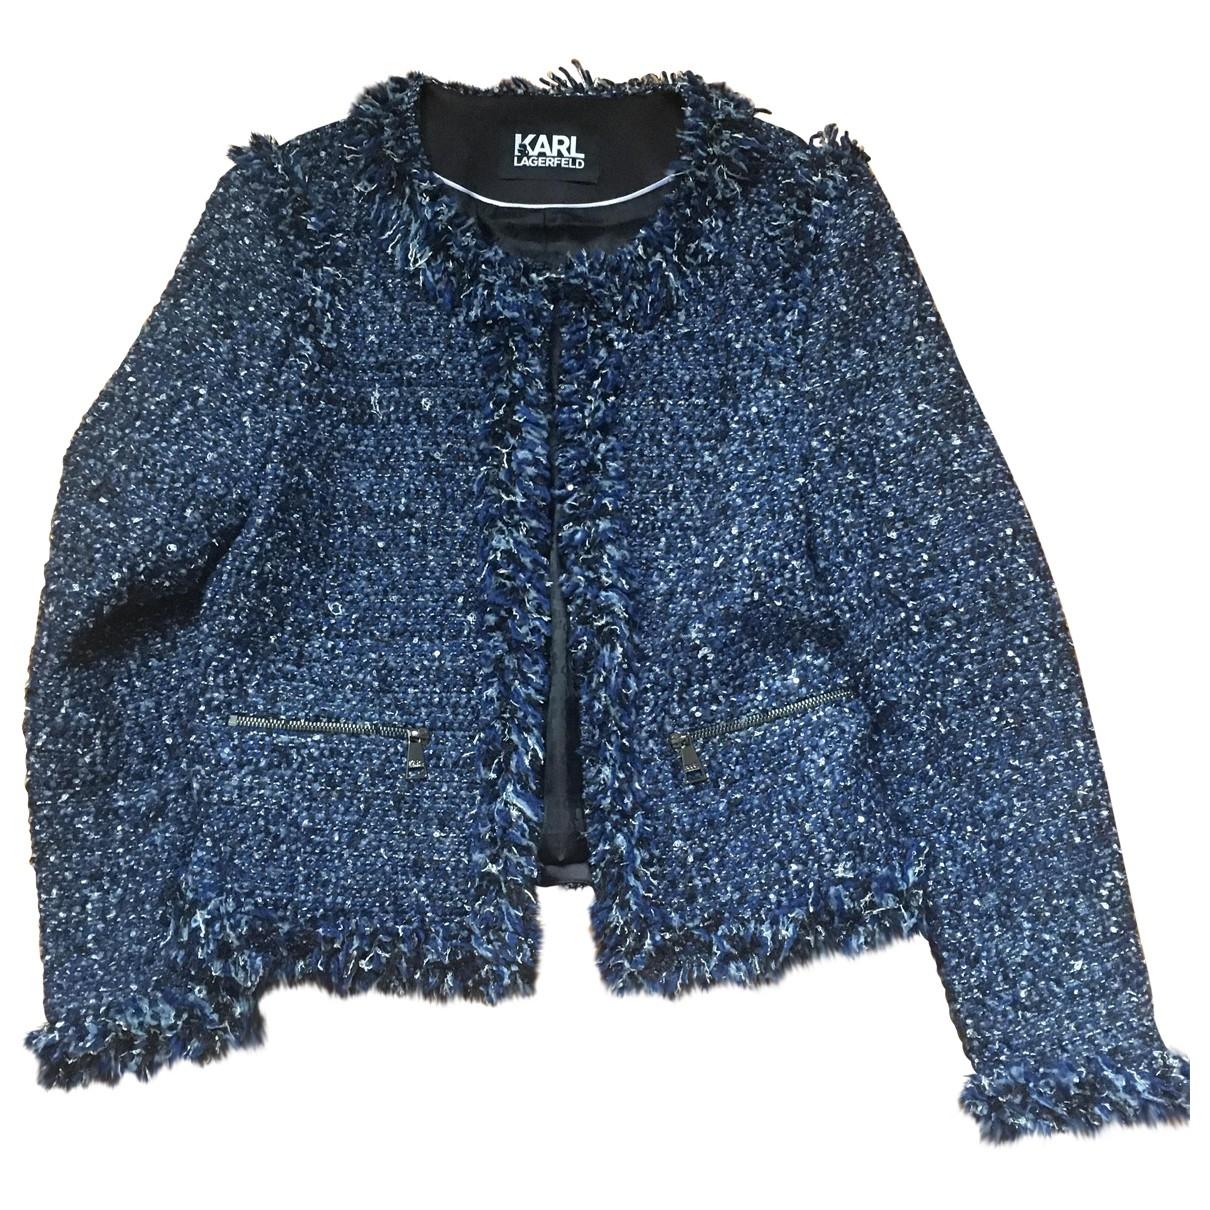 Karl Lagerfeld - Veste   pour femme - bleu